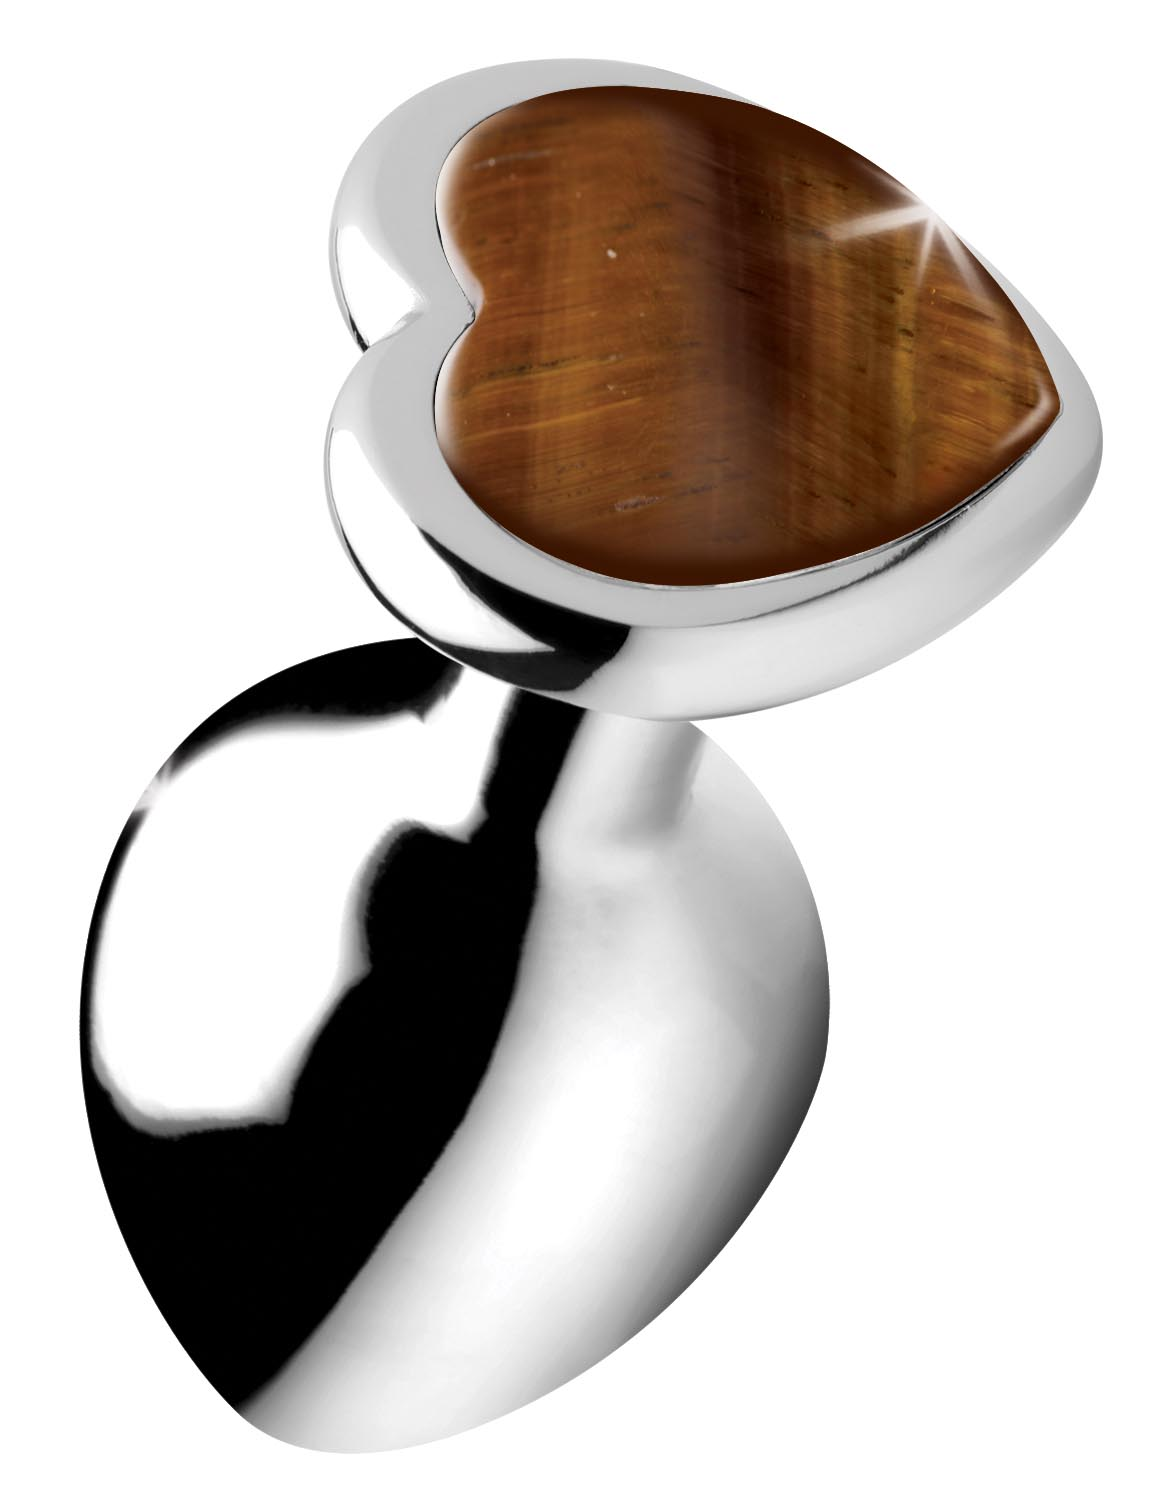 Authentic Tigers Eye Gemstone Heart Anal Plug – Medium